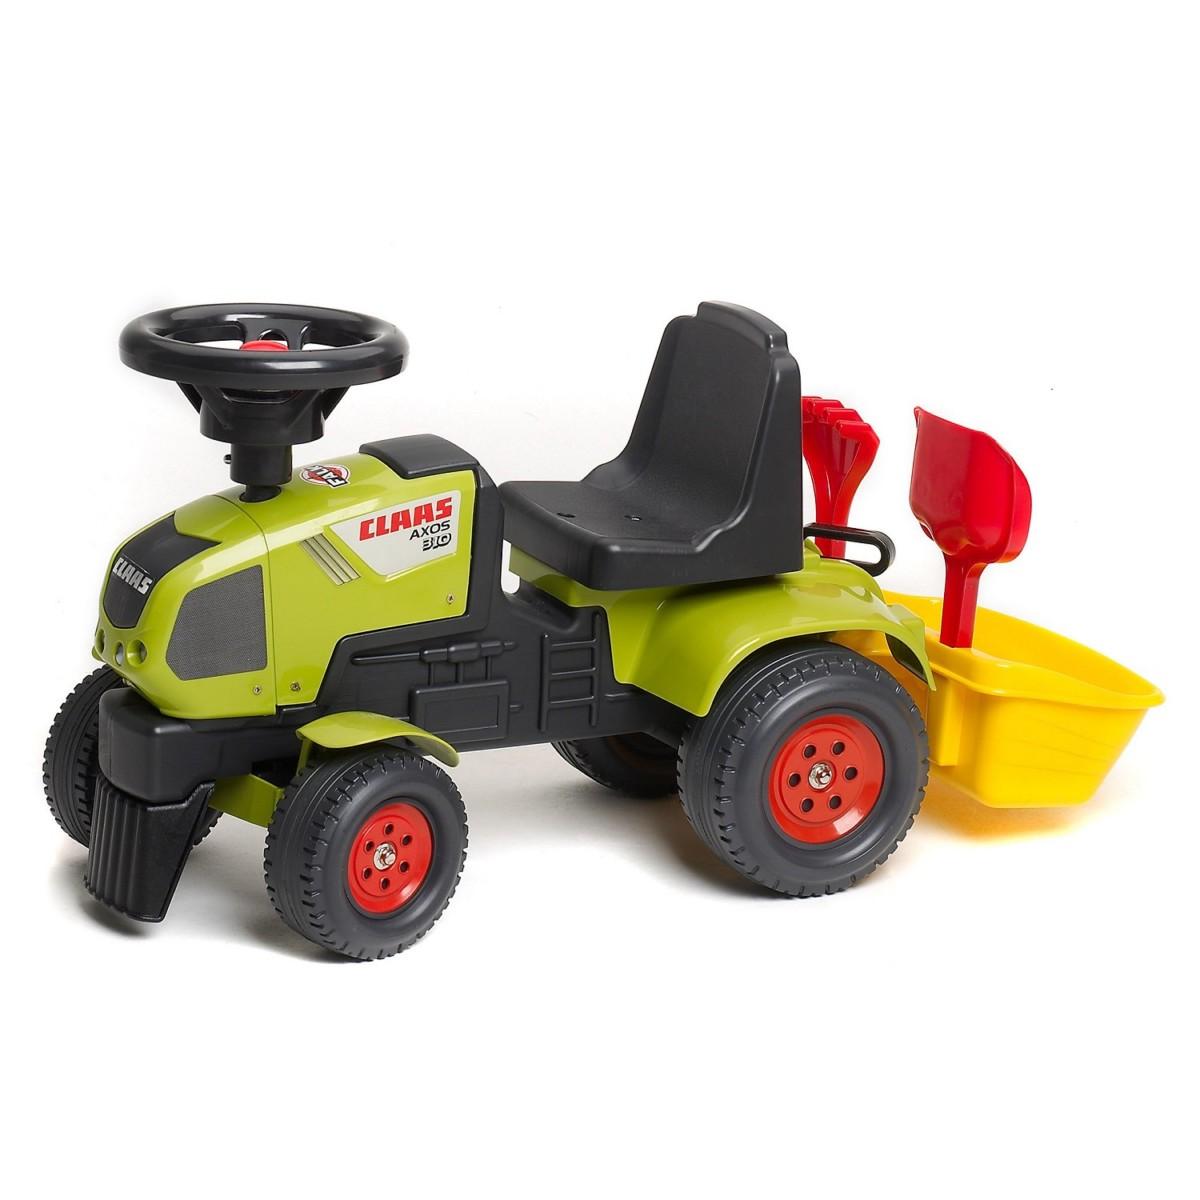 Tracteur Baby Claas Axos + Remorque et accessoires (sans